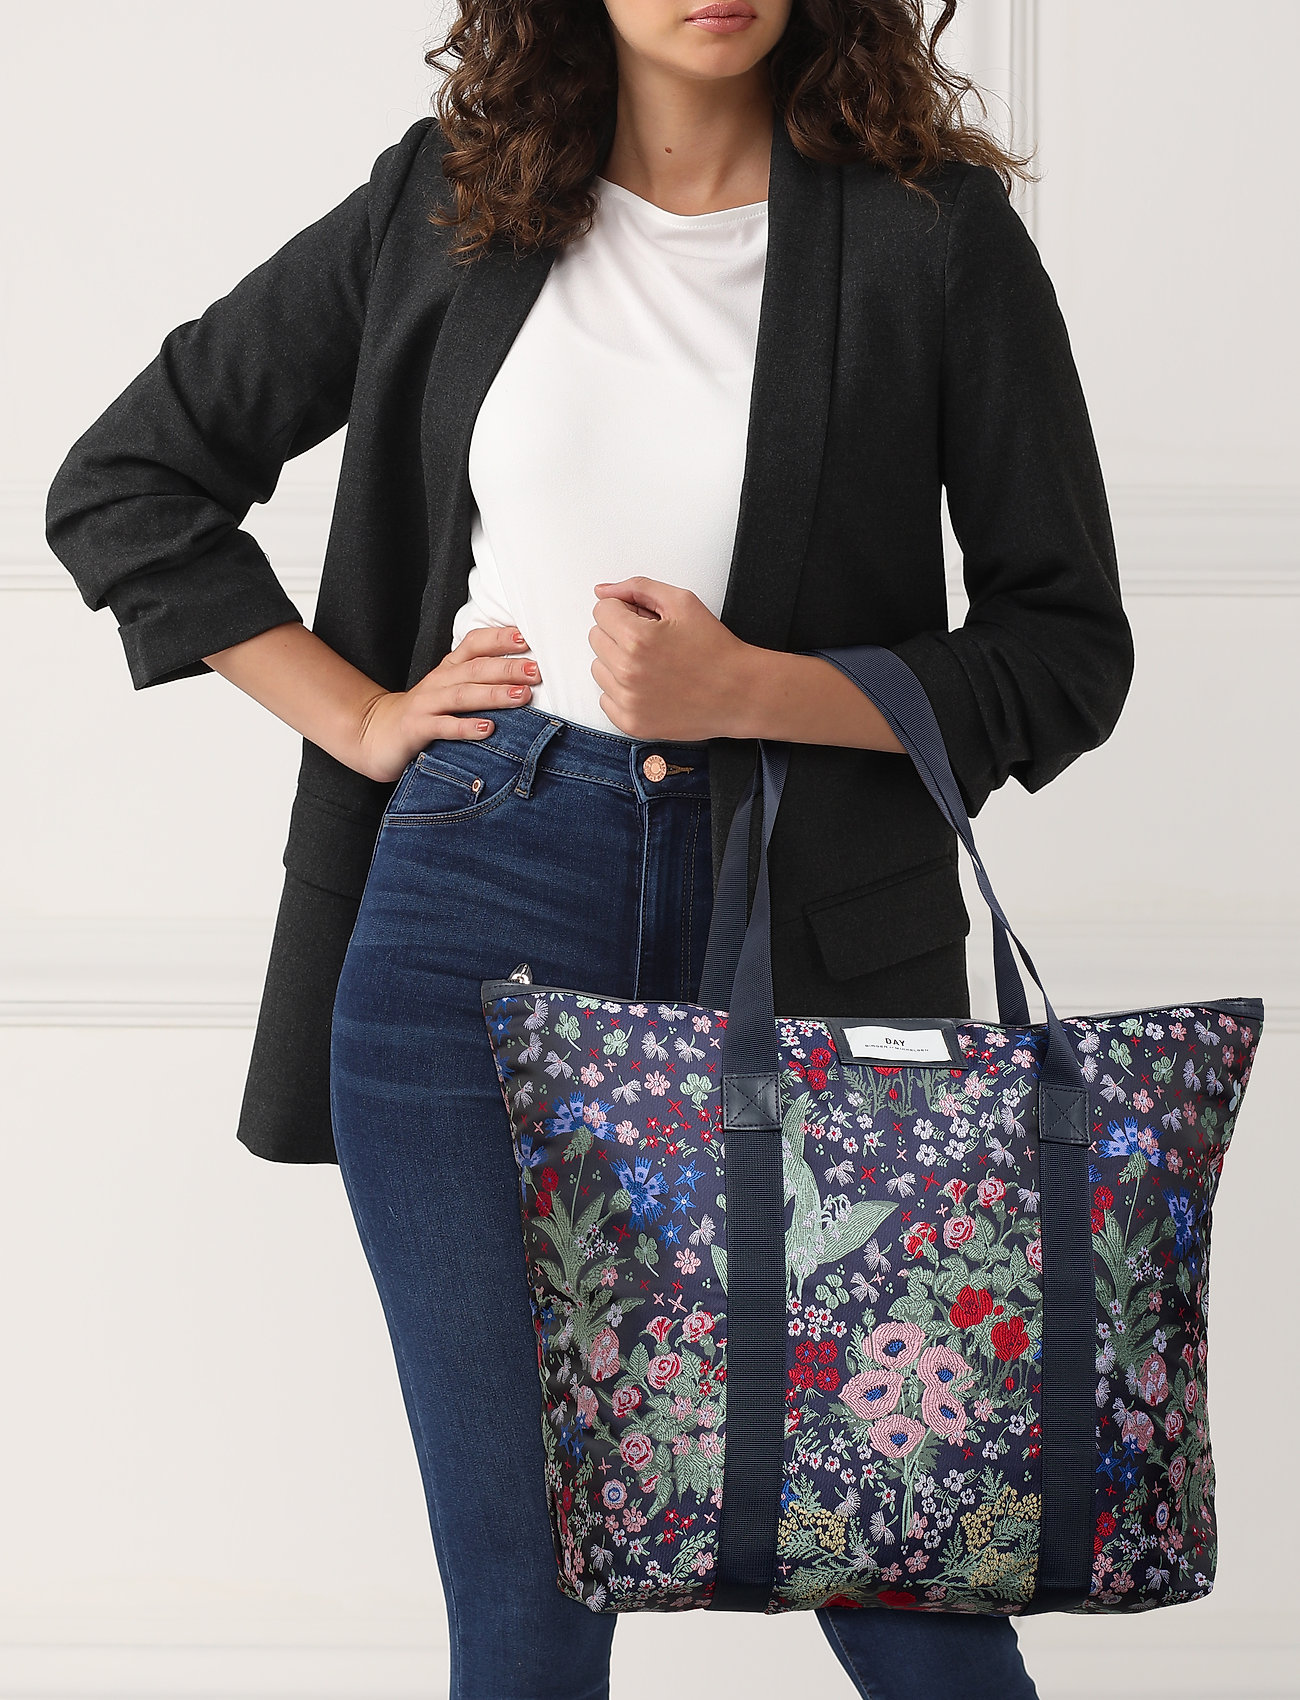 DAY et Day Gweneth Bloomy Bag - MULTI COLOUR